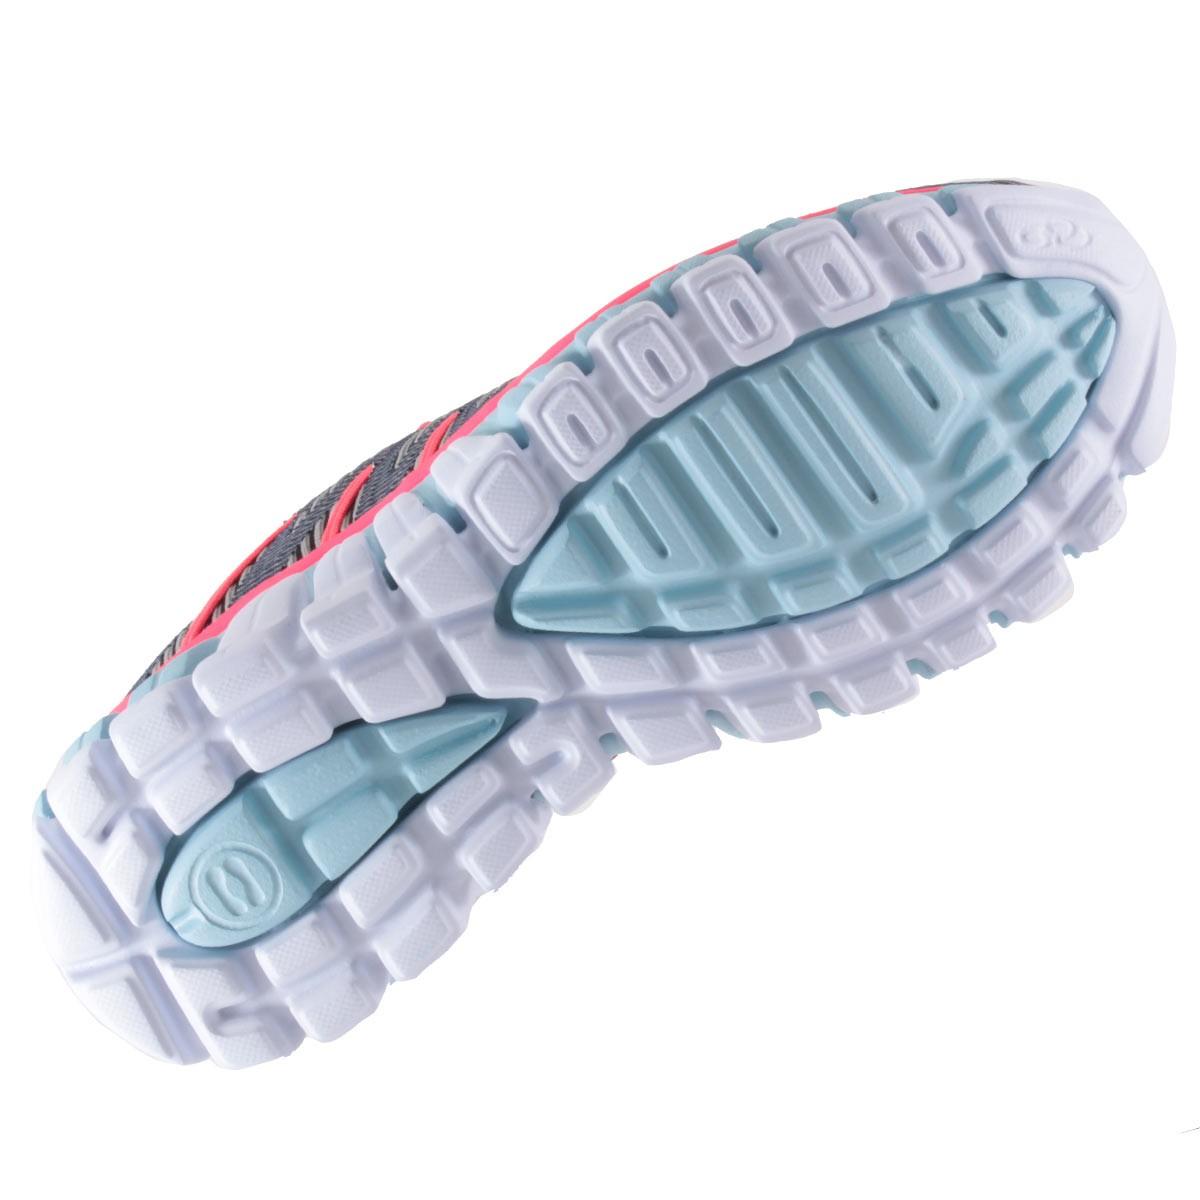 Tênis Olympikus Style Feminino Caminhada Corrida Lindo 298  - Ian Calçados